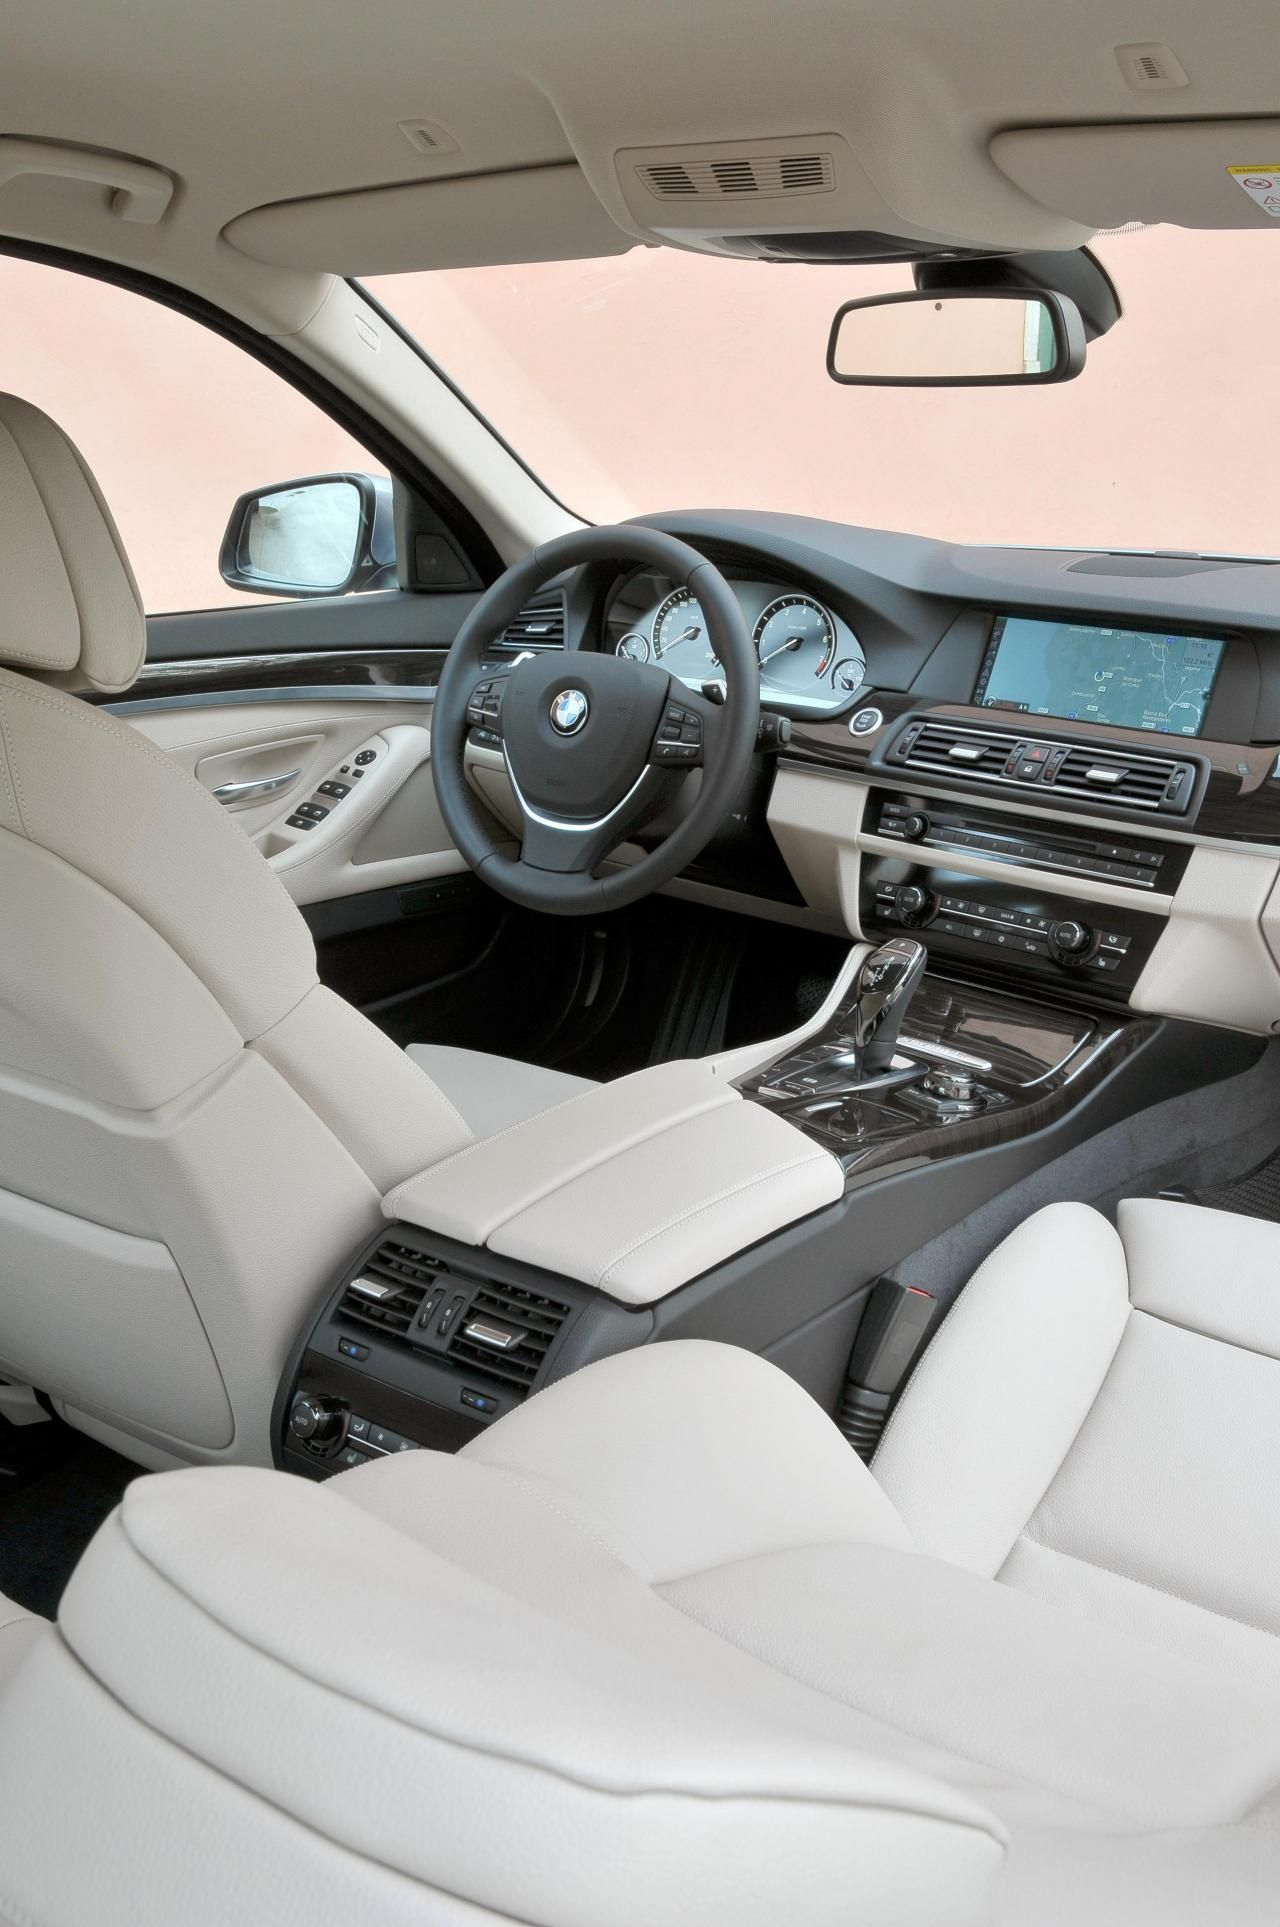 ♂ 2013 BMW 5 ActiveHybrid interior | DREAMS | Pinterest | BMW ...